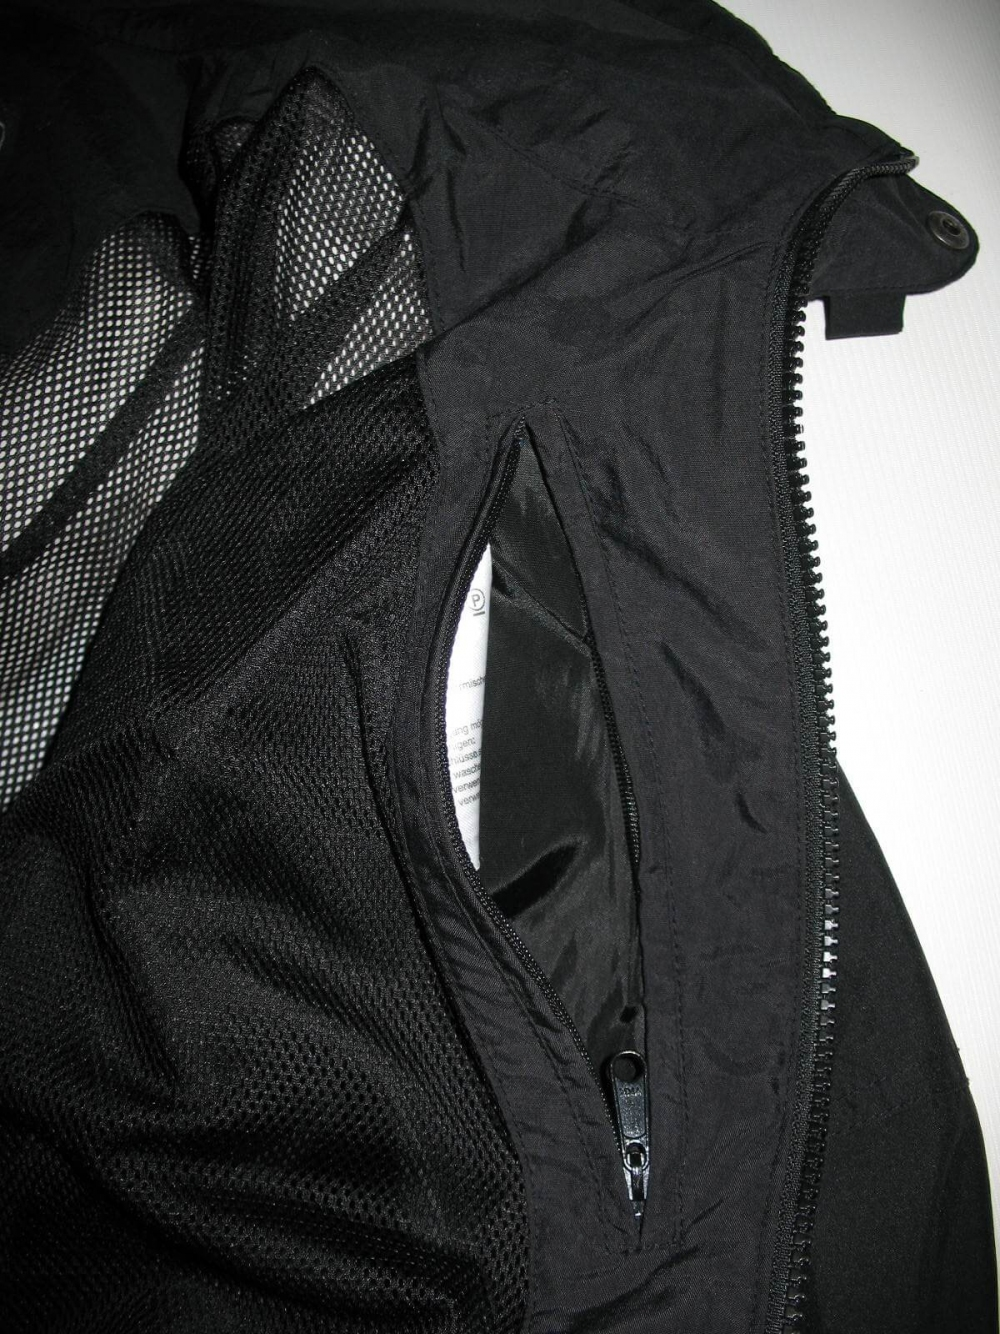 Куртка SCHOFFEL khar jacket (размер 56/XXL) - 8